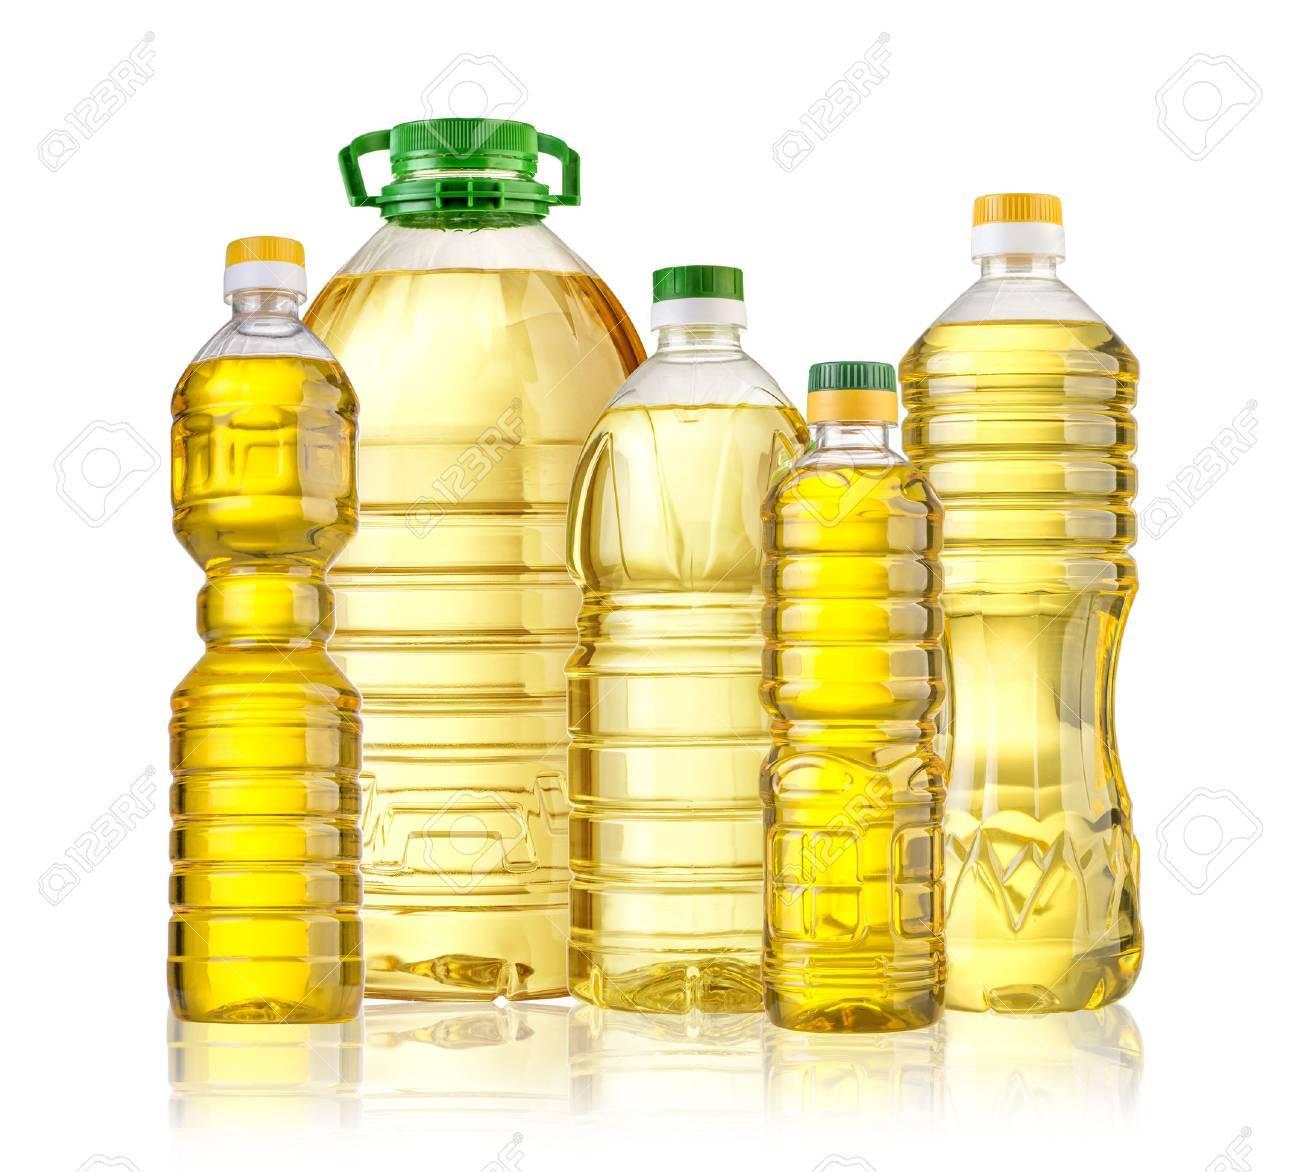 Olive oil bottle isolated on white backgrouund - 46797203